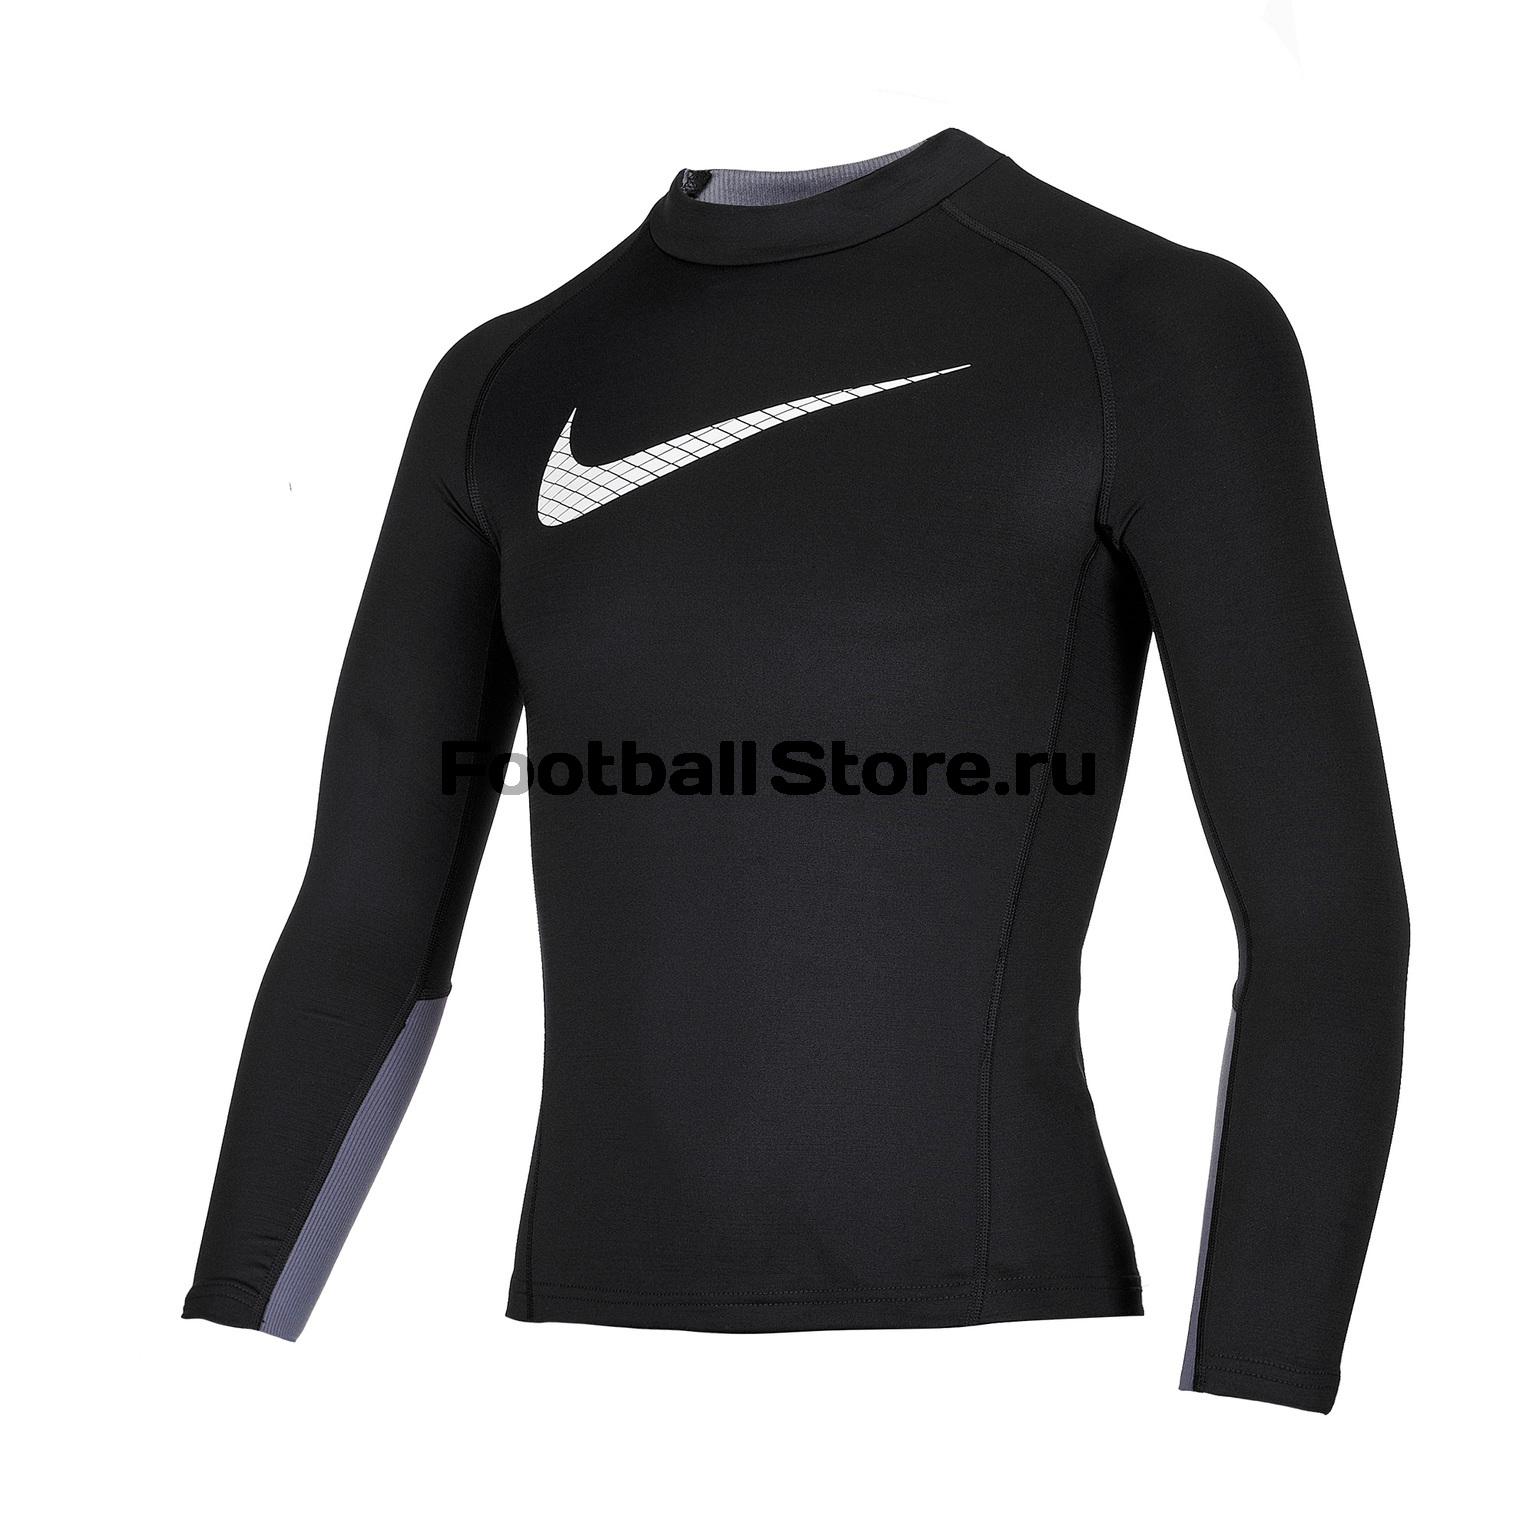 Белье футболка подростковая Nike Warm Top GFX AH3997-010 куртка подростковая nike team winter jacket 645907 010